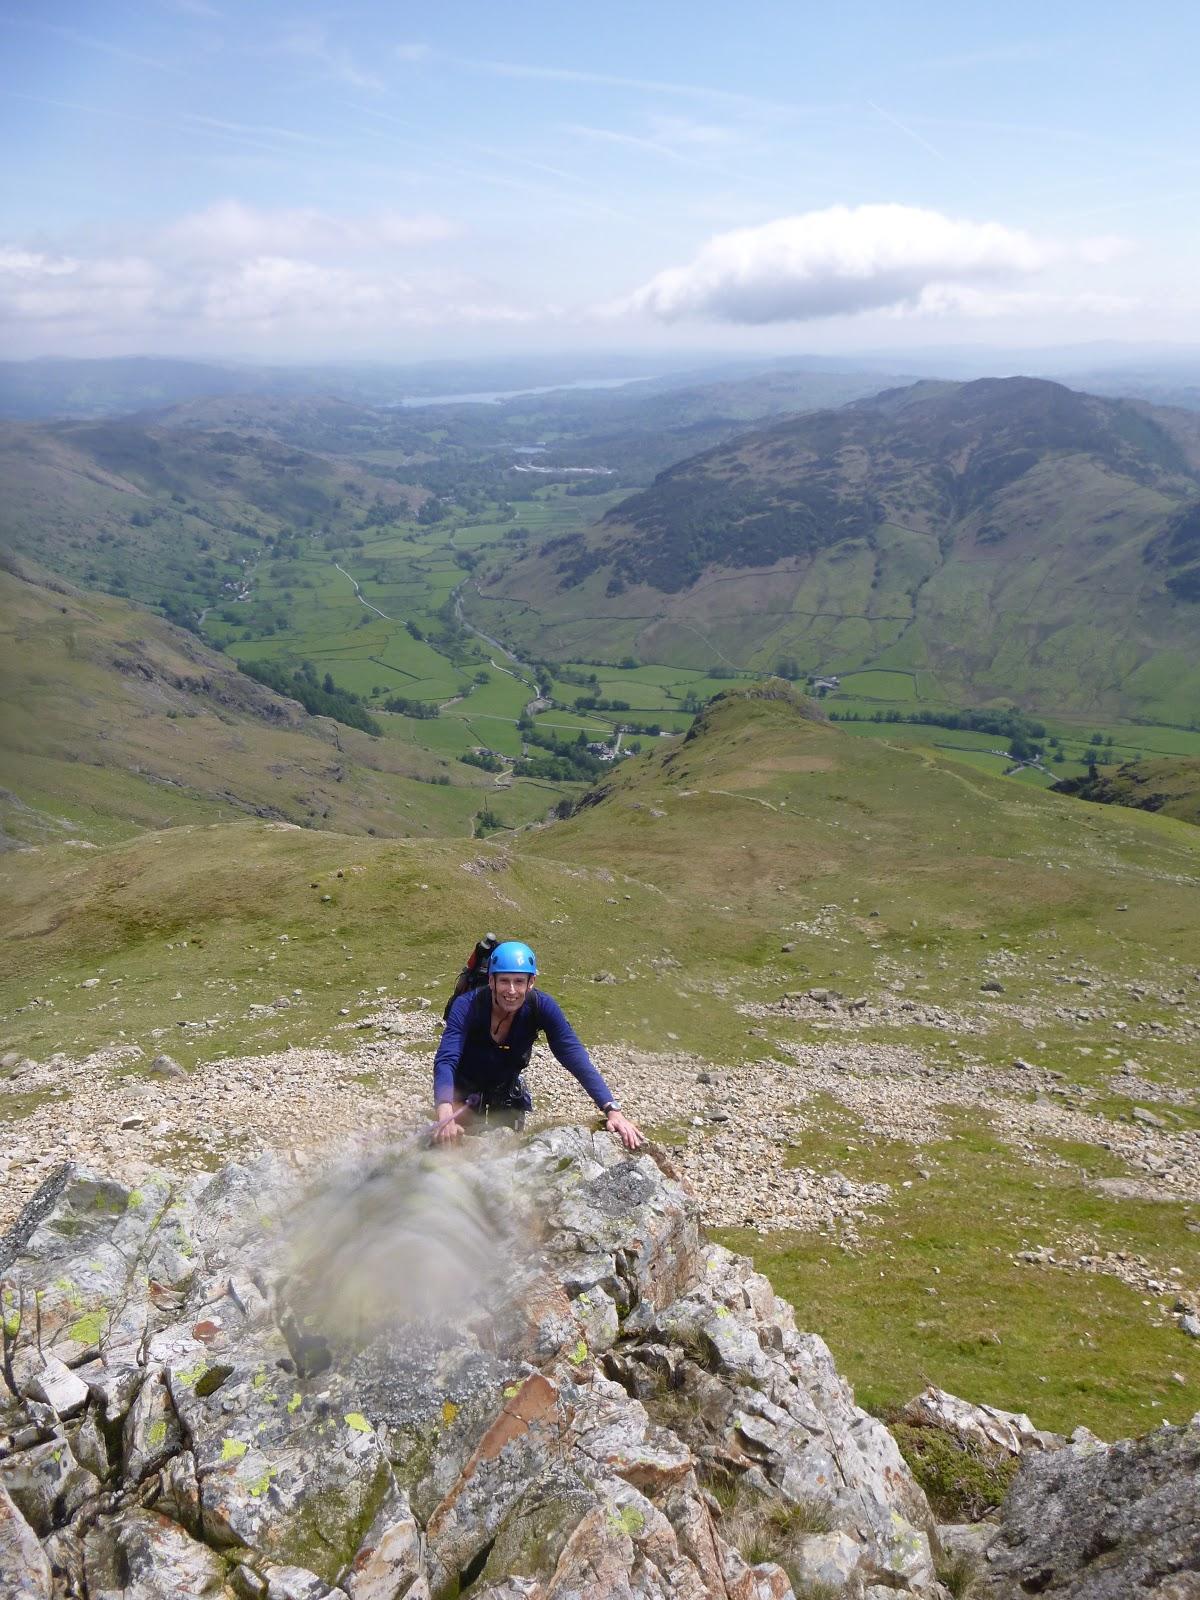 Outdoor Courses For Scrambling Climbing Kayaking Amp Mountain Activities